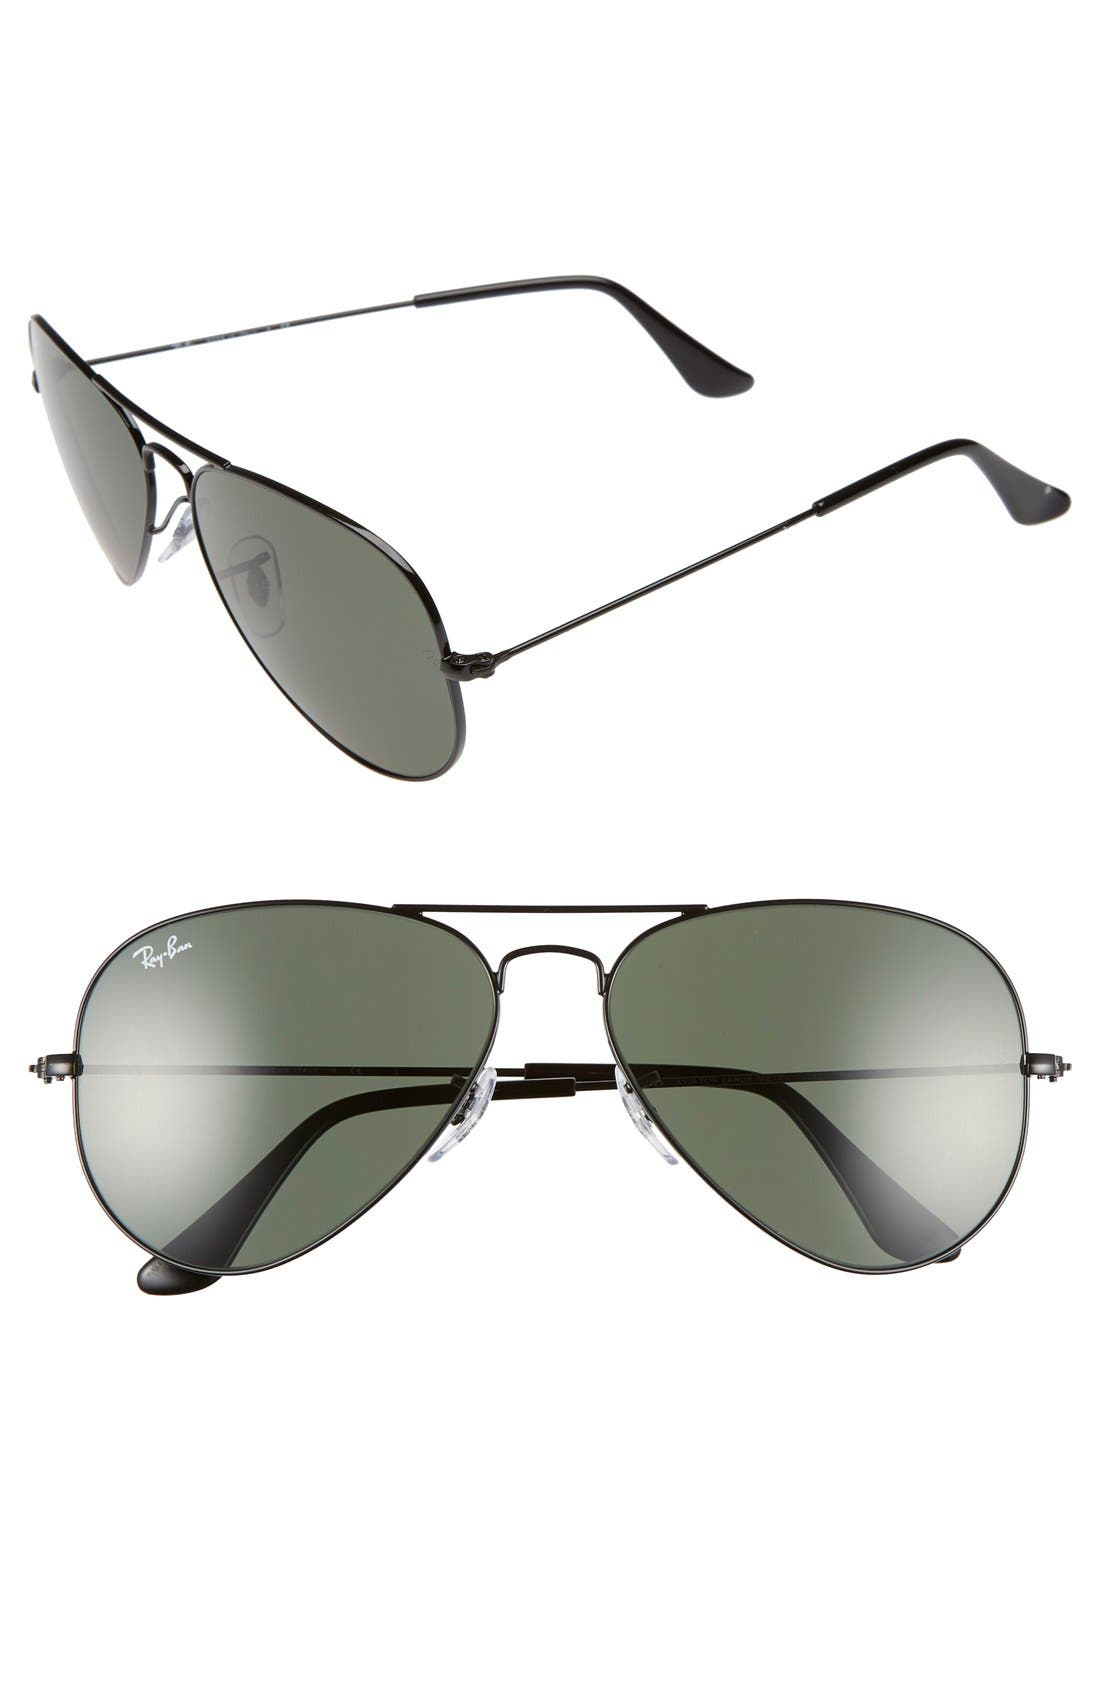 Ray-Ban Standard Original 5m Aviator Sunglasses - Black